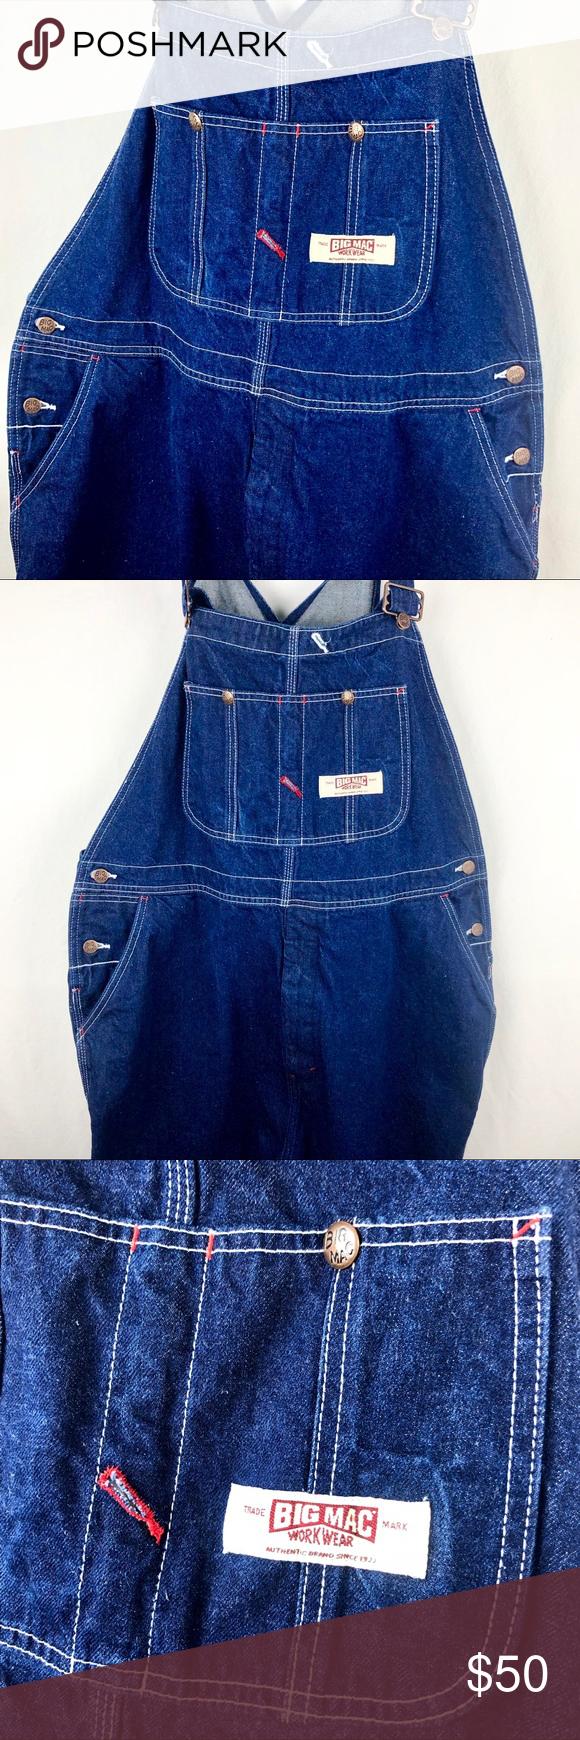 vtg big mac overalls denim jeans mens 44x34 work denim on cheap insulated coveralls for men id=11154